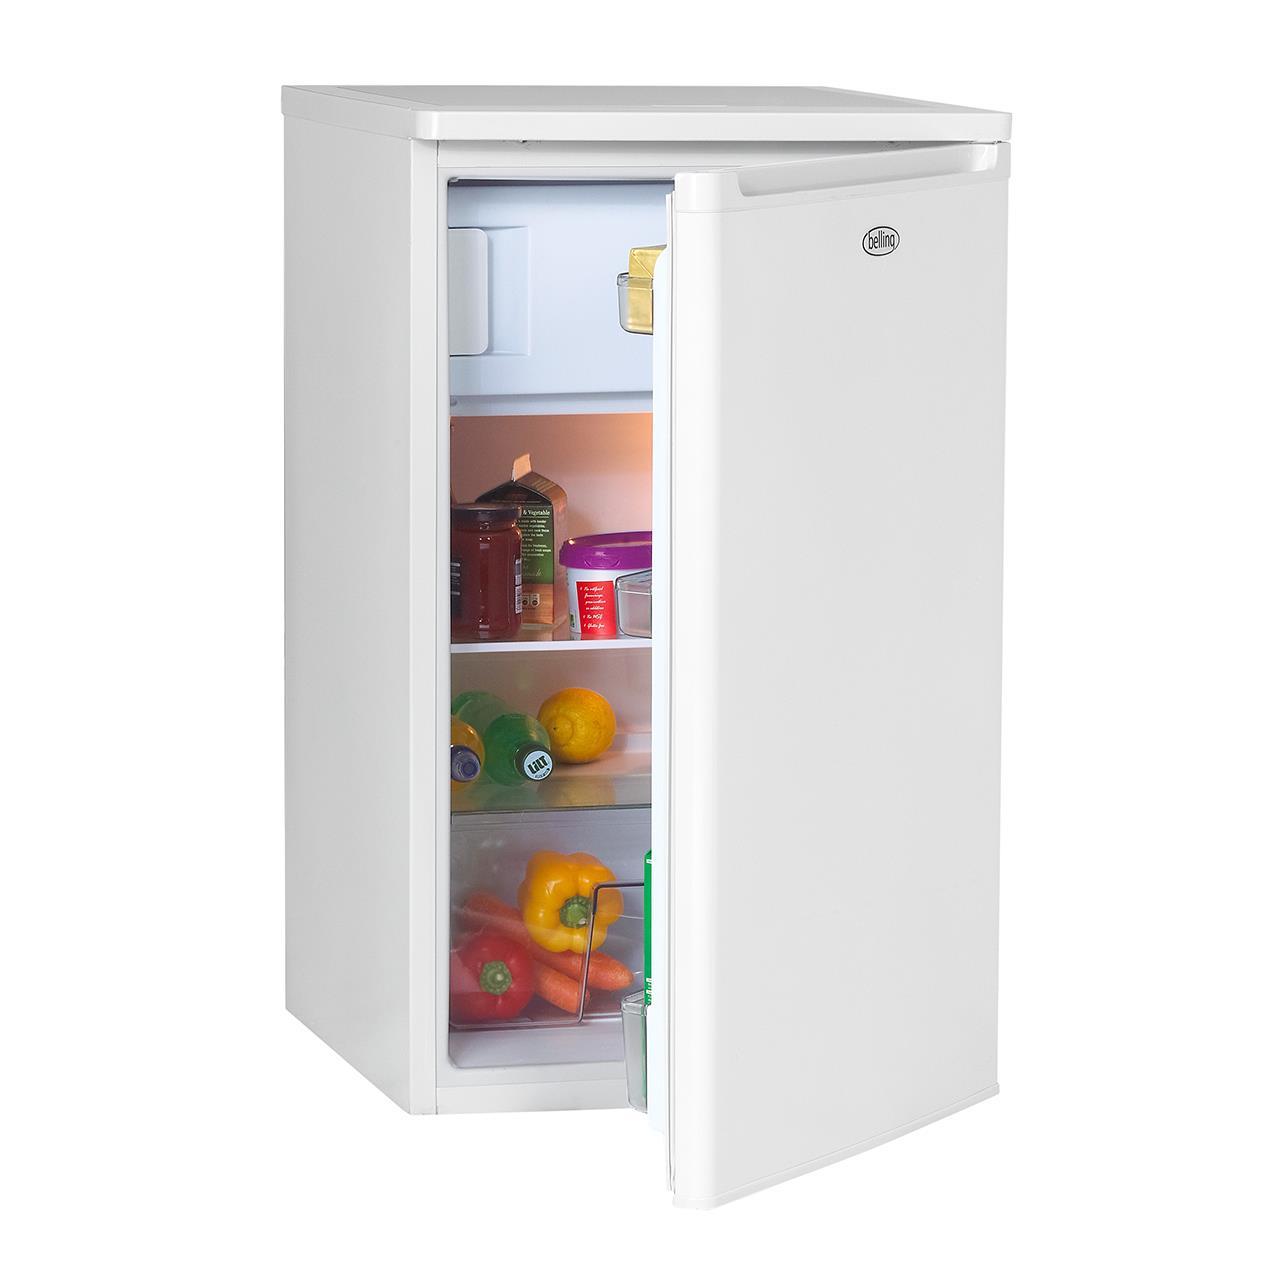 Counter Fridge Buy Belling Br98wh 50cm White Under Counter Fridge With Freezer